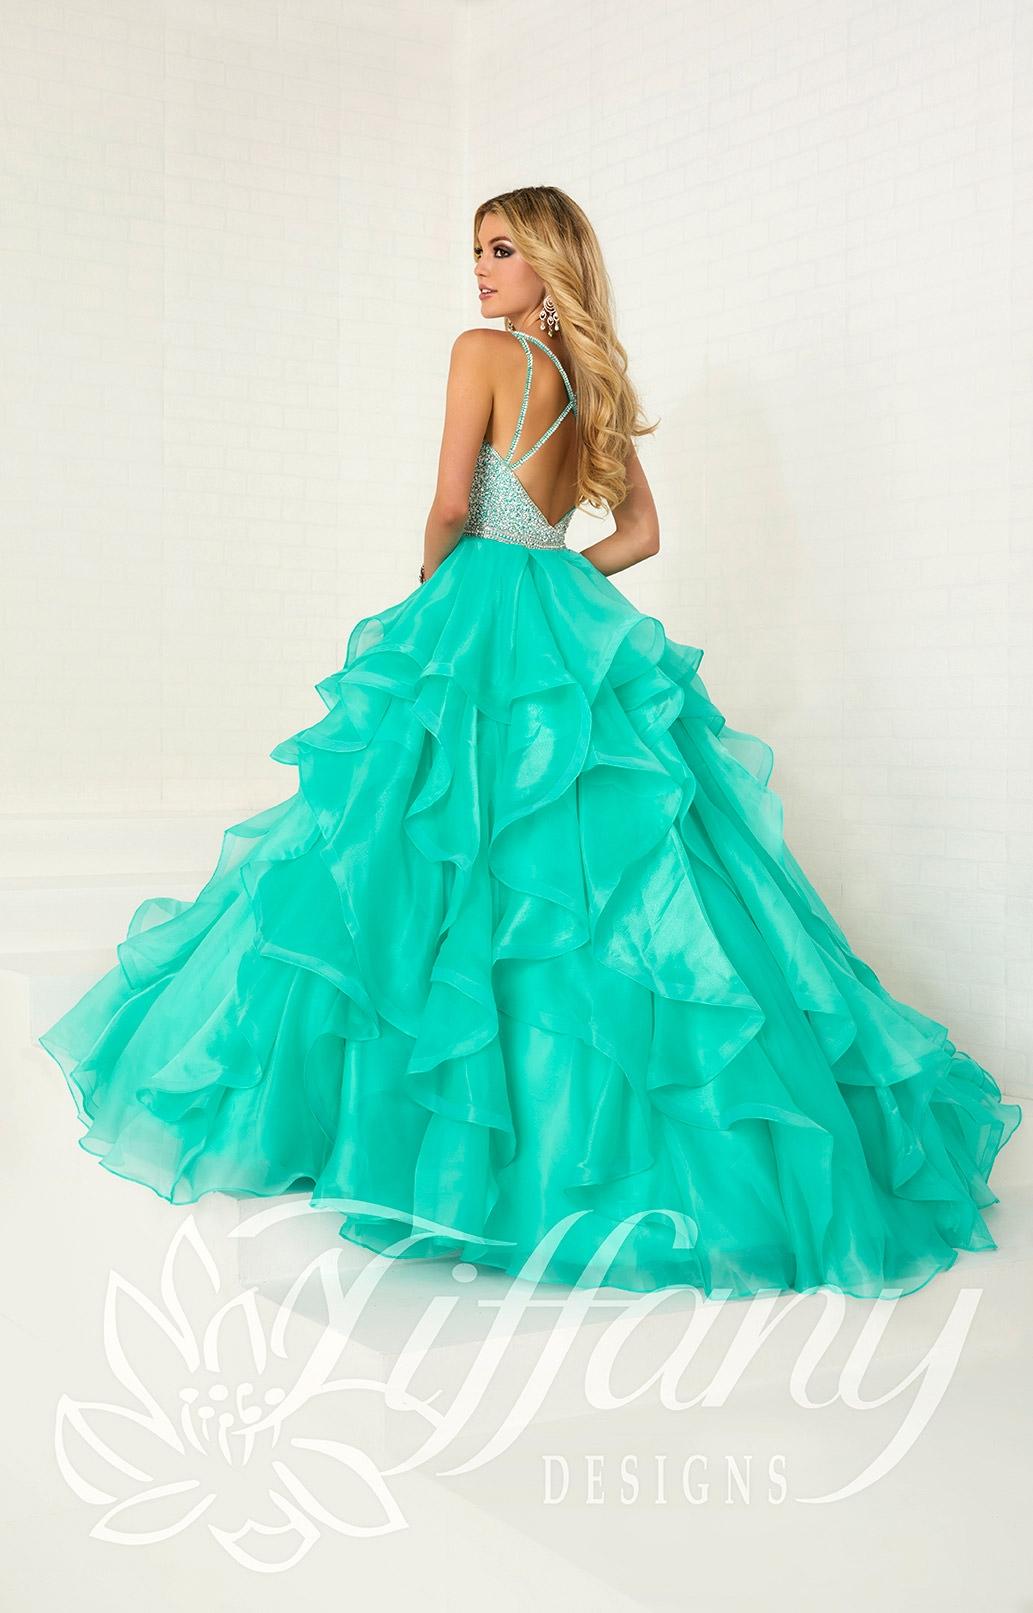 Tiffany Designs 16300 - Long Organza Ball Gown Prom Dress